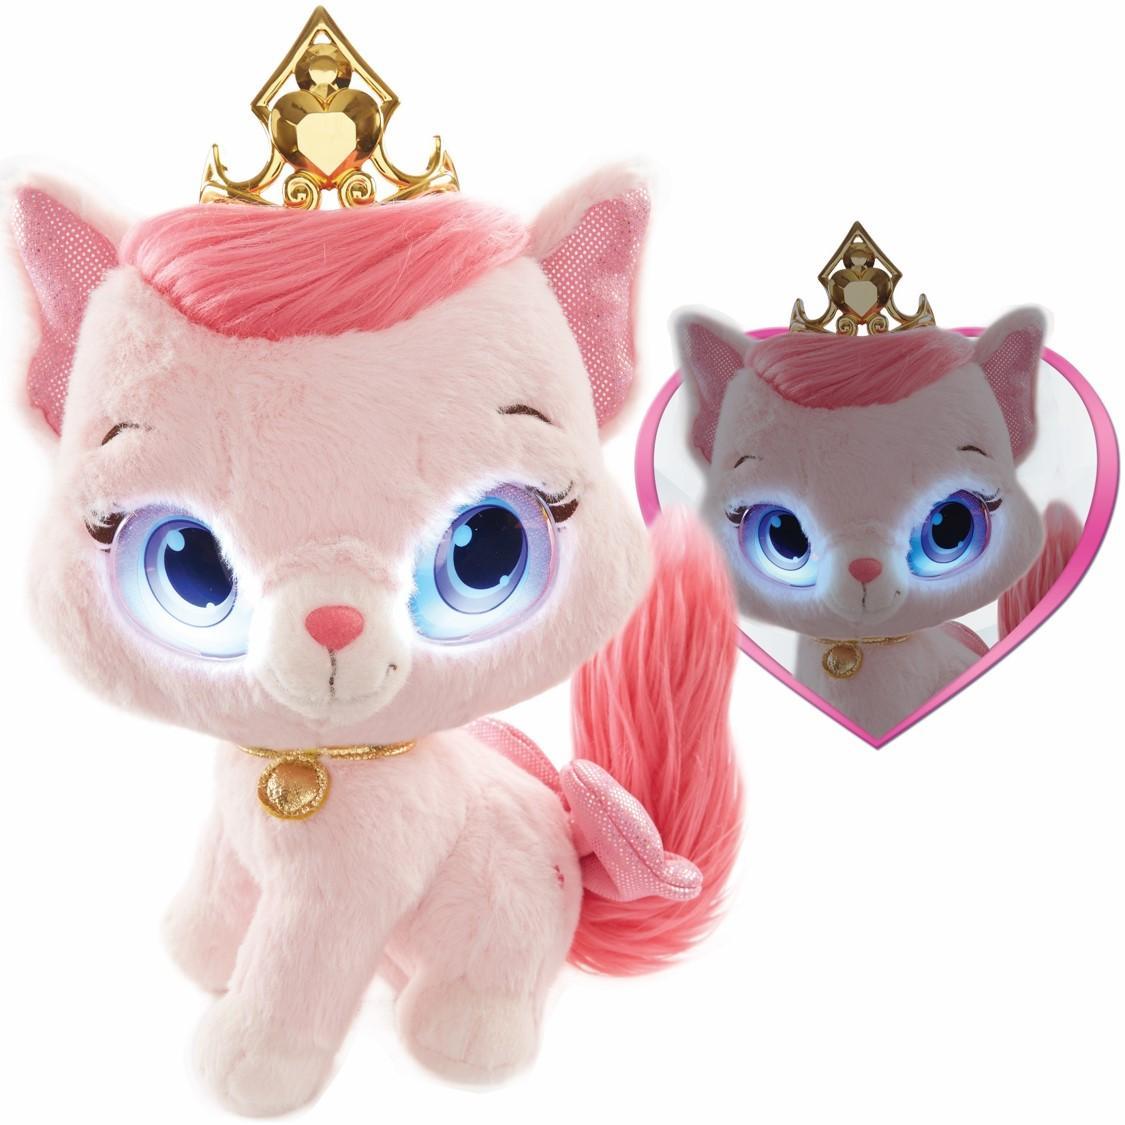 Disney princess palace pets bright eyes feature plush for Amazon com pillow pets